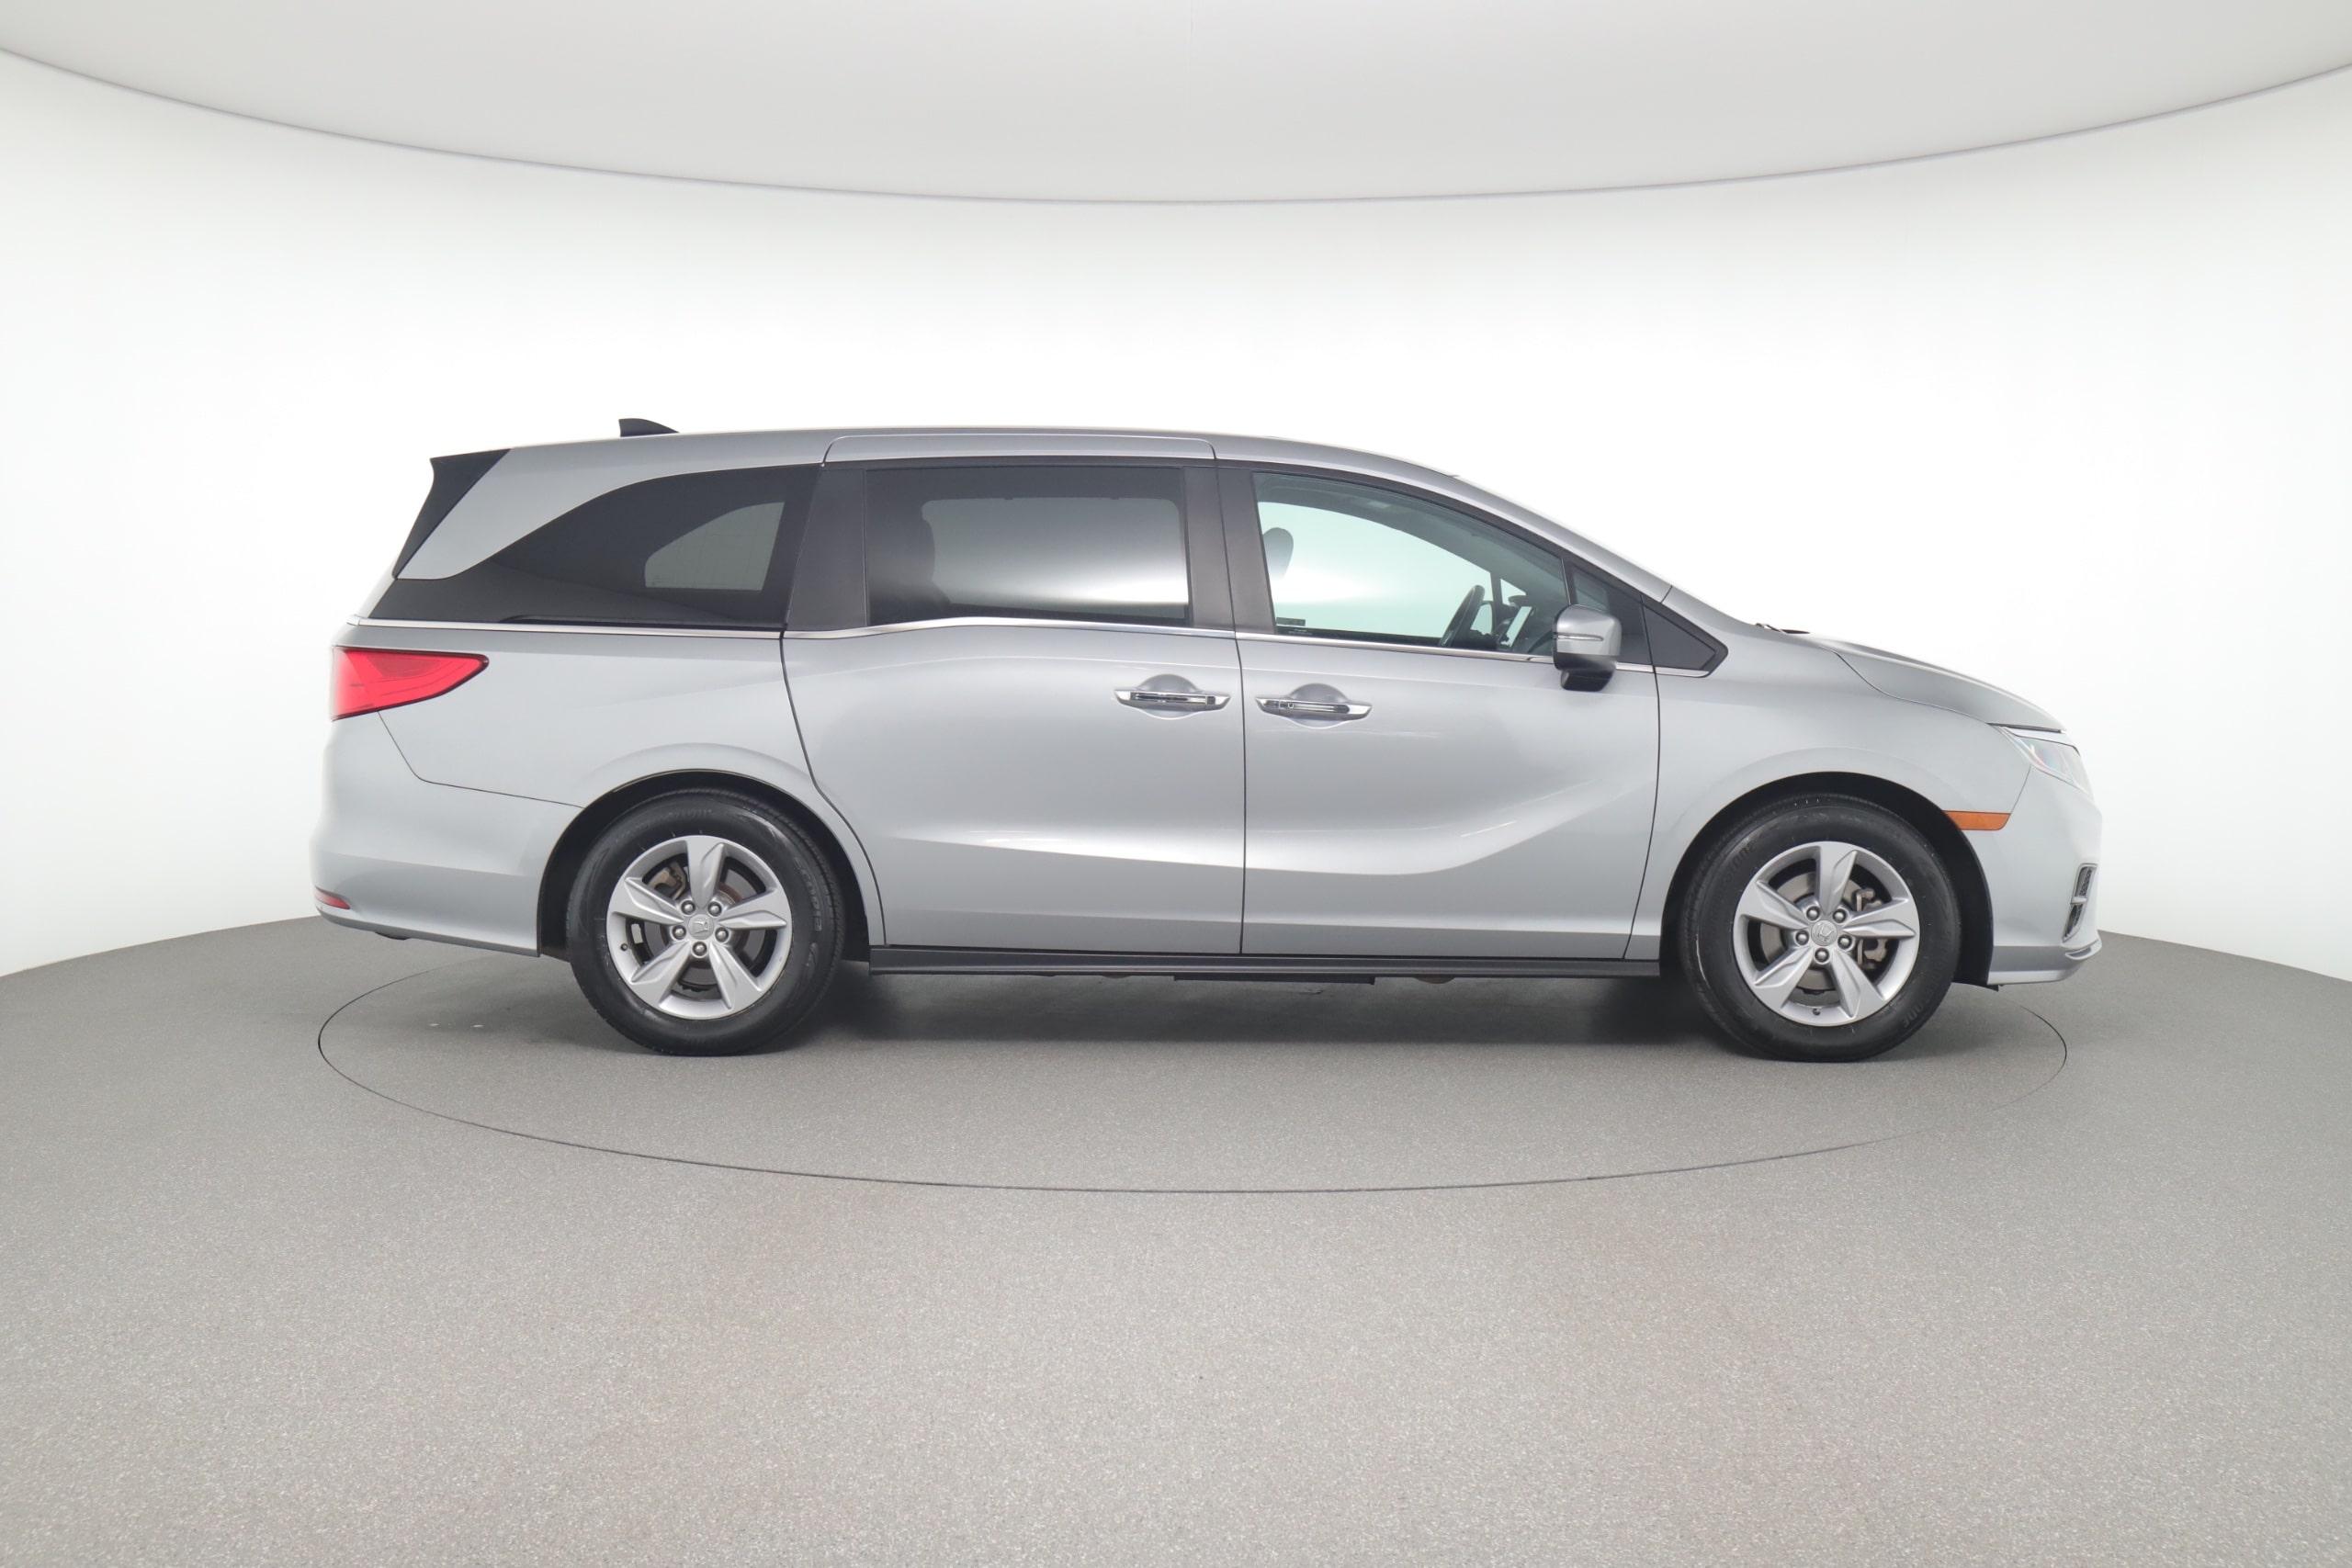 Honda Odyssey vs. Toyota Sienna: Which Minivan Has the Best Features?